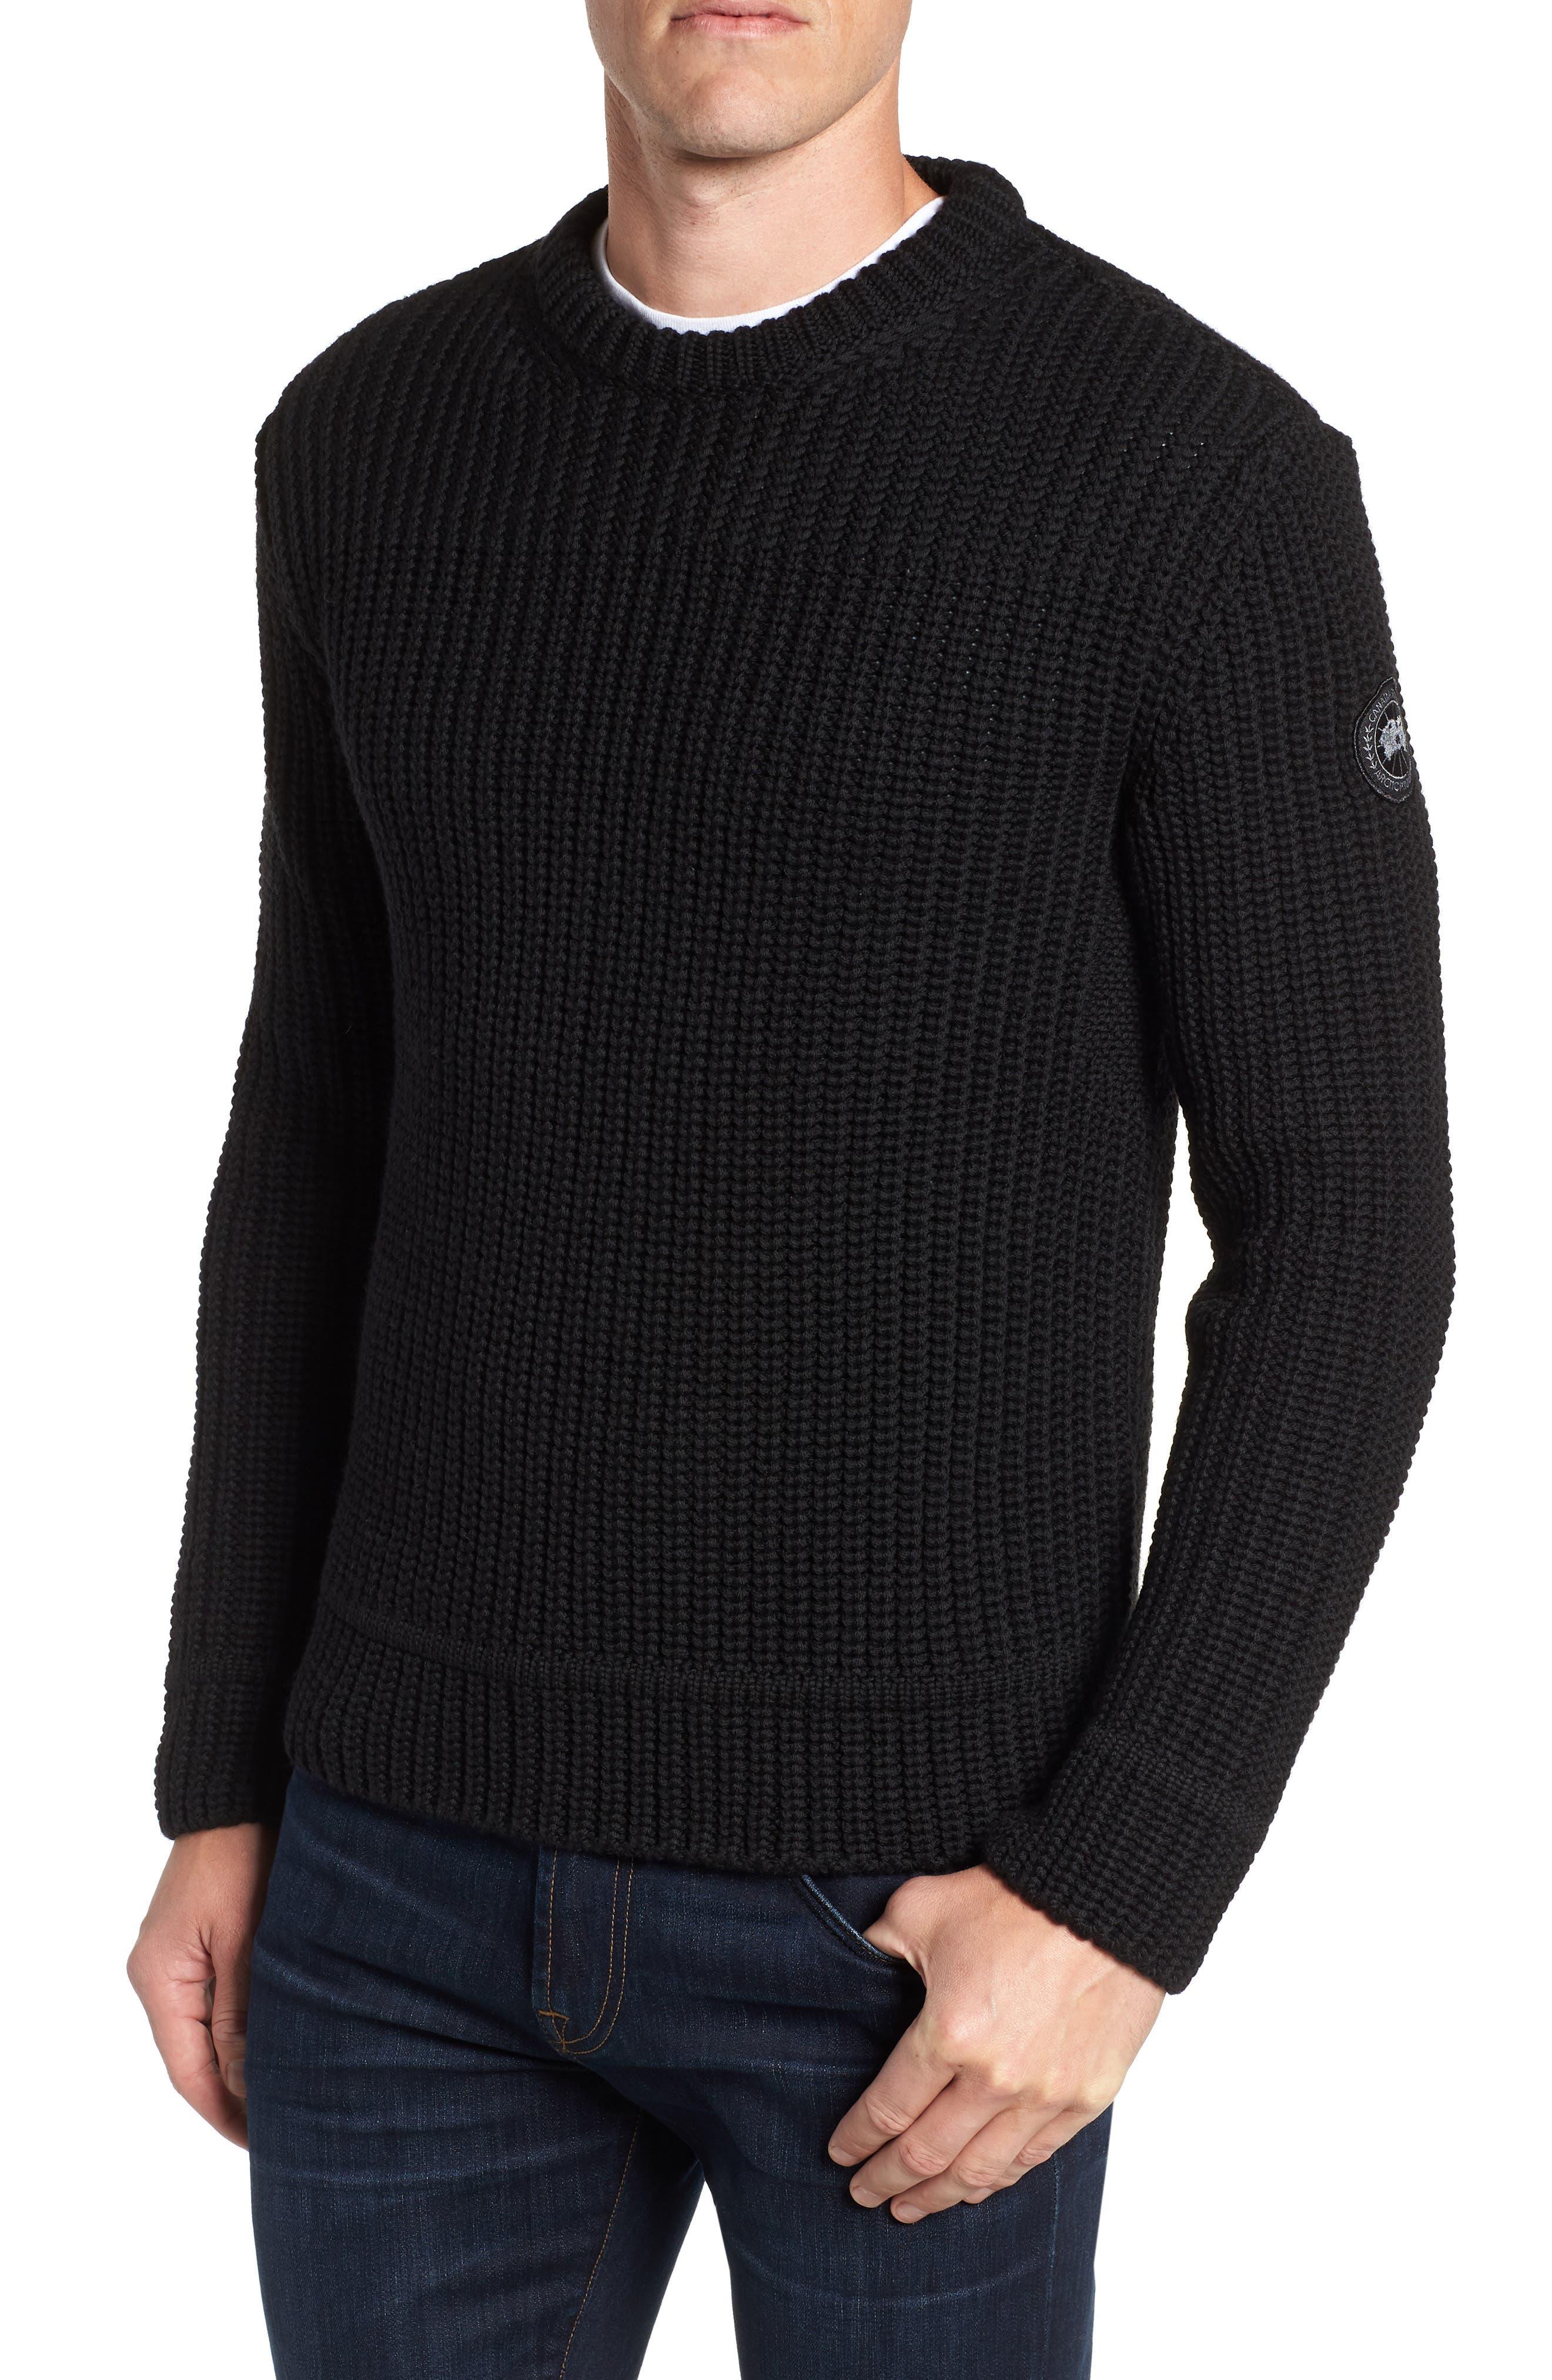 Galloway Regular Fit Merino Wool Sweater,                             Main thumbnail 1, color,                             BLACK